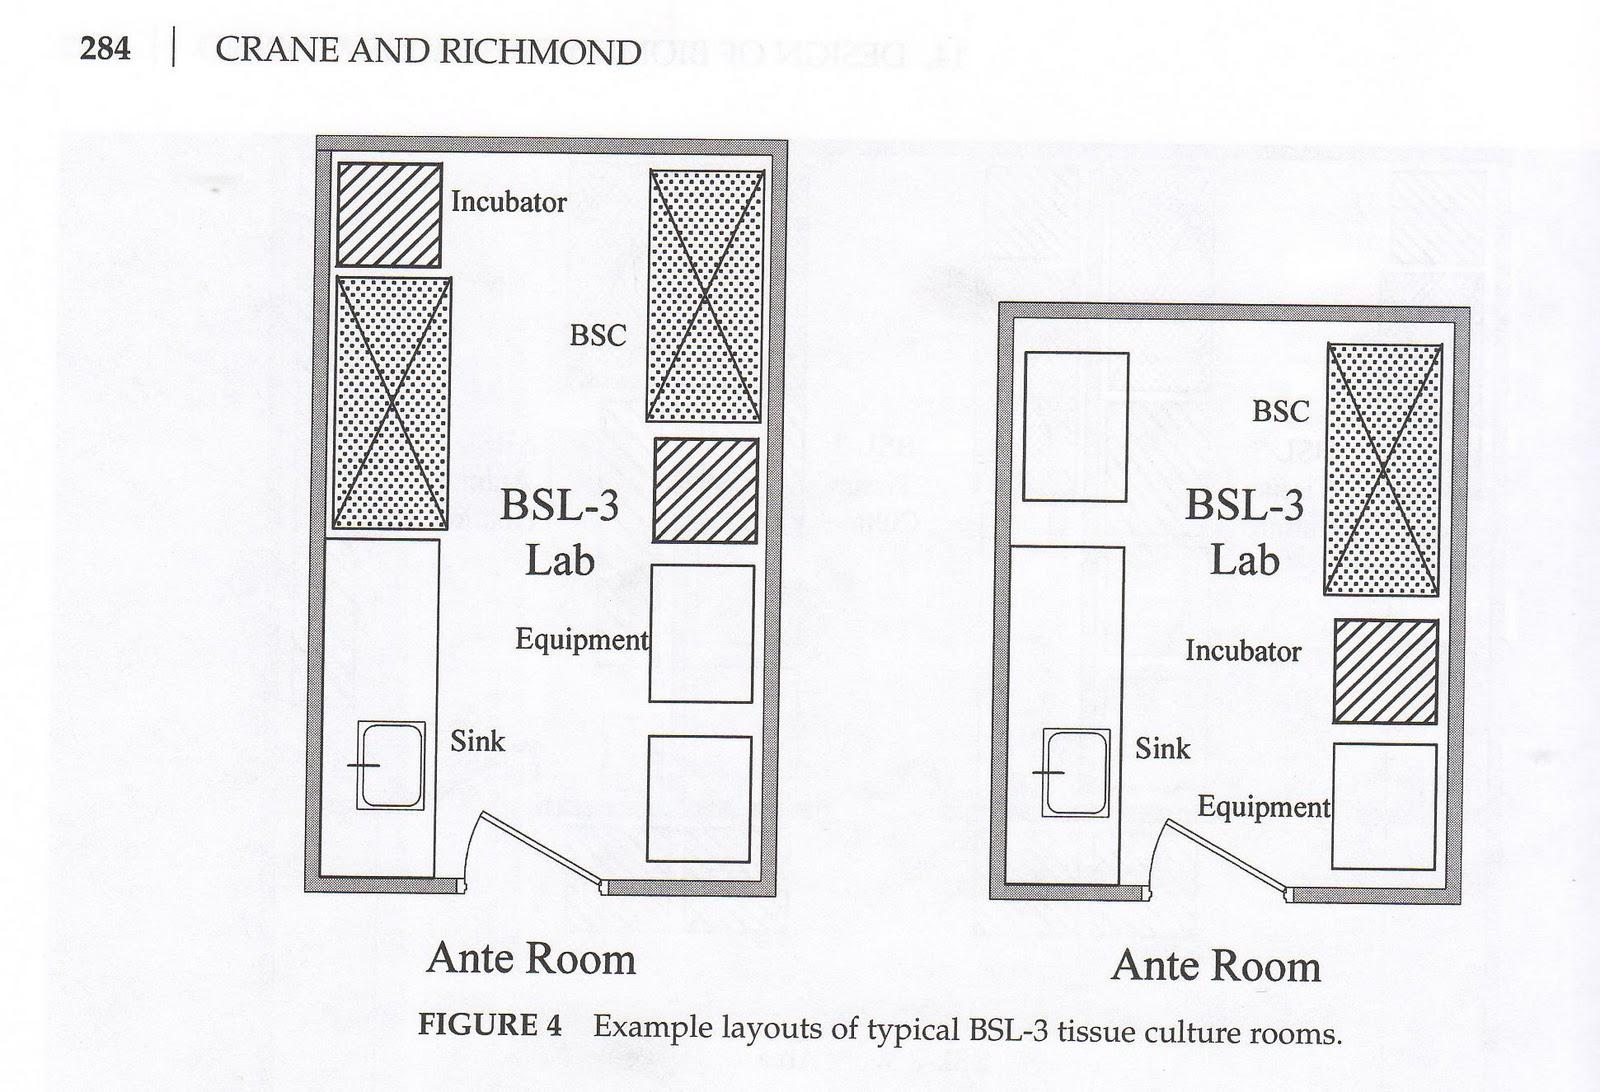 Plant tissue culture laboratory design layout crazywidowinfo